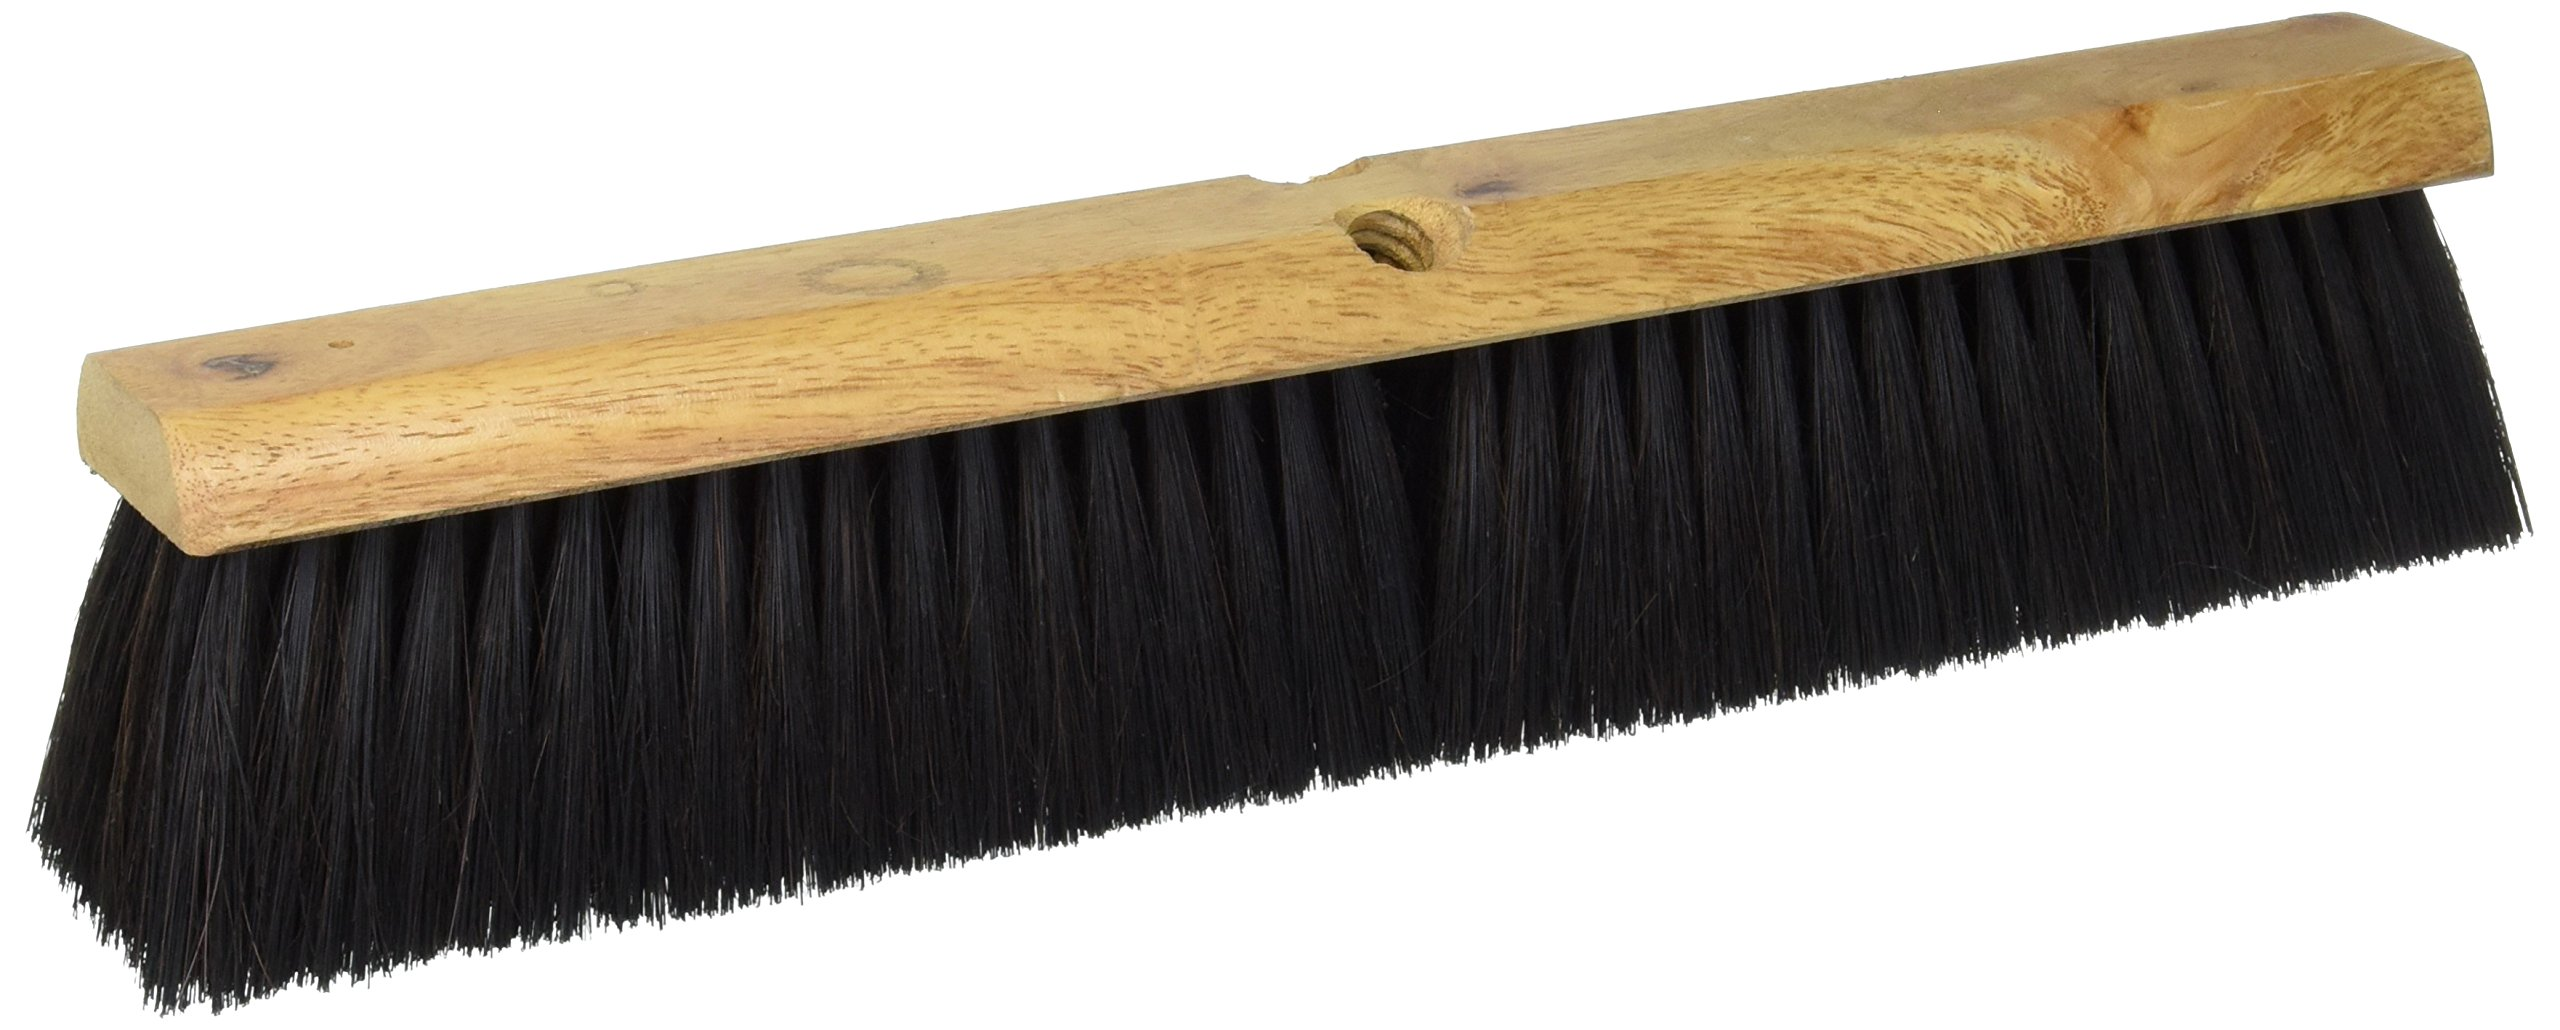 No. 9X Line Floor Brushes - 18'' floor brush w/m60horsehair p 2d04b1d